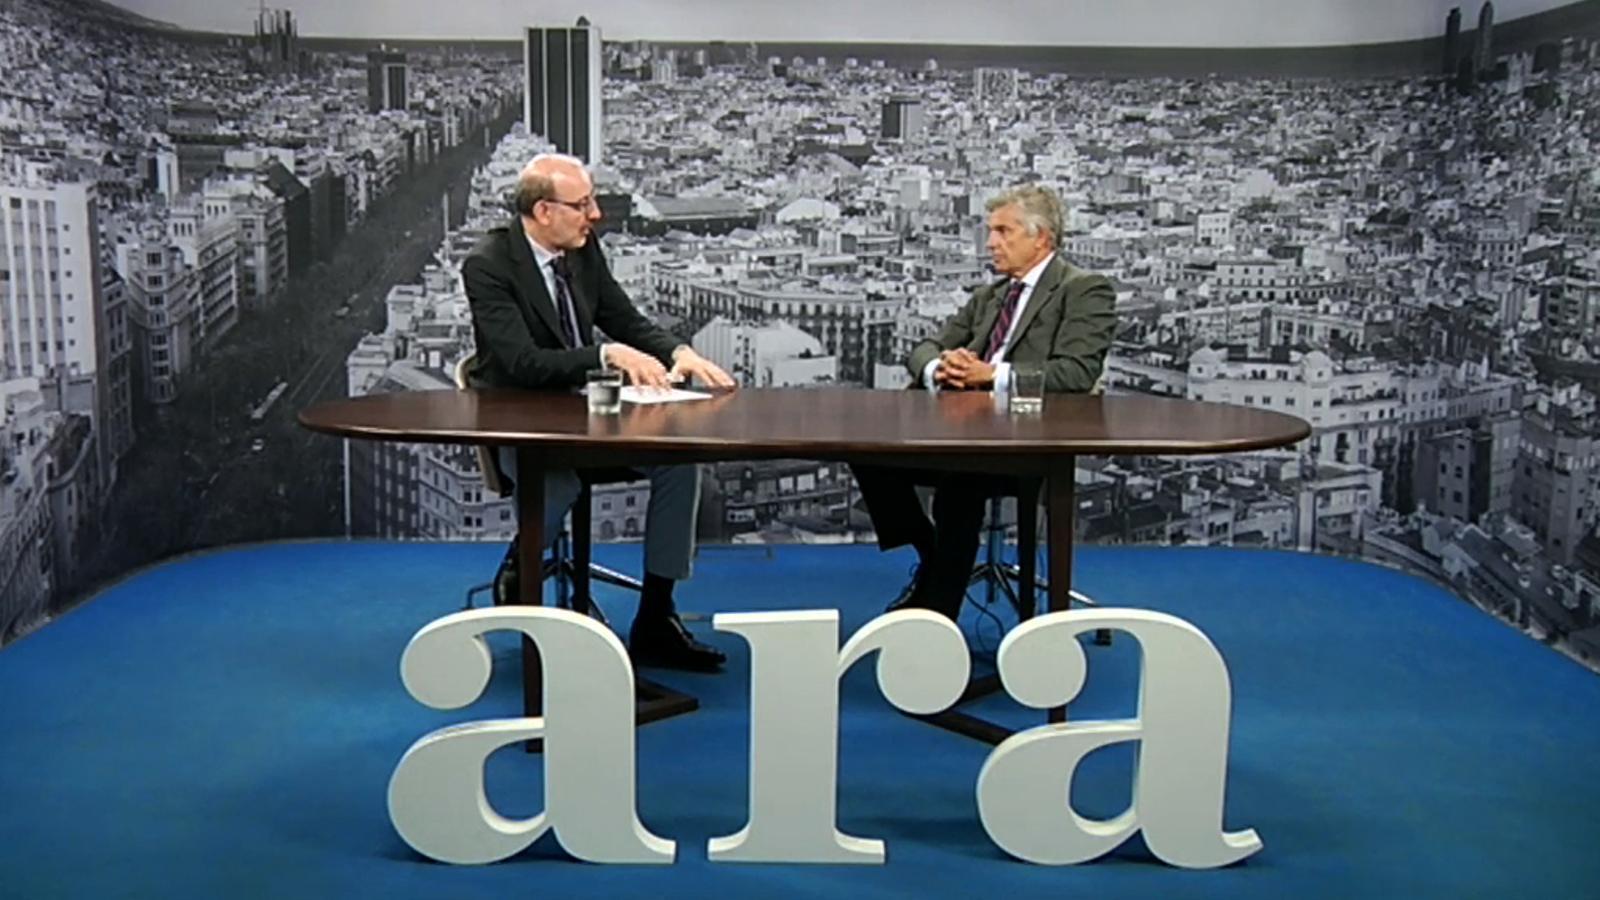 Entrevista d'Antoni Bassas a J. A. Samaranch Salisachs